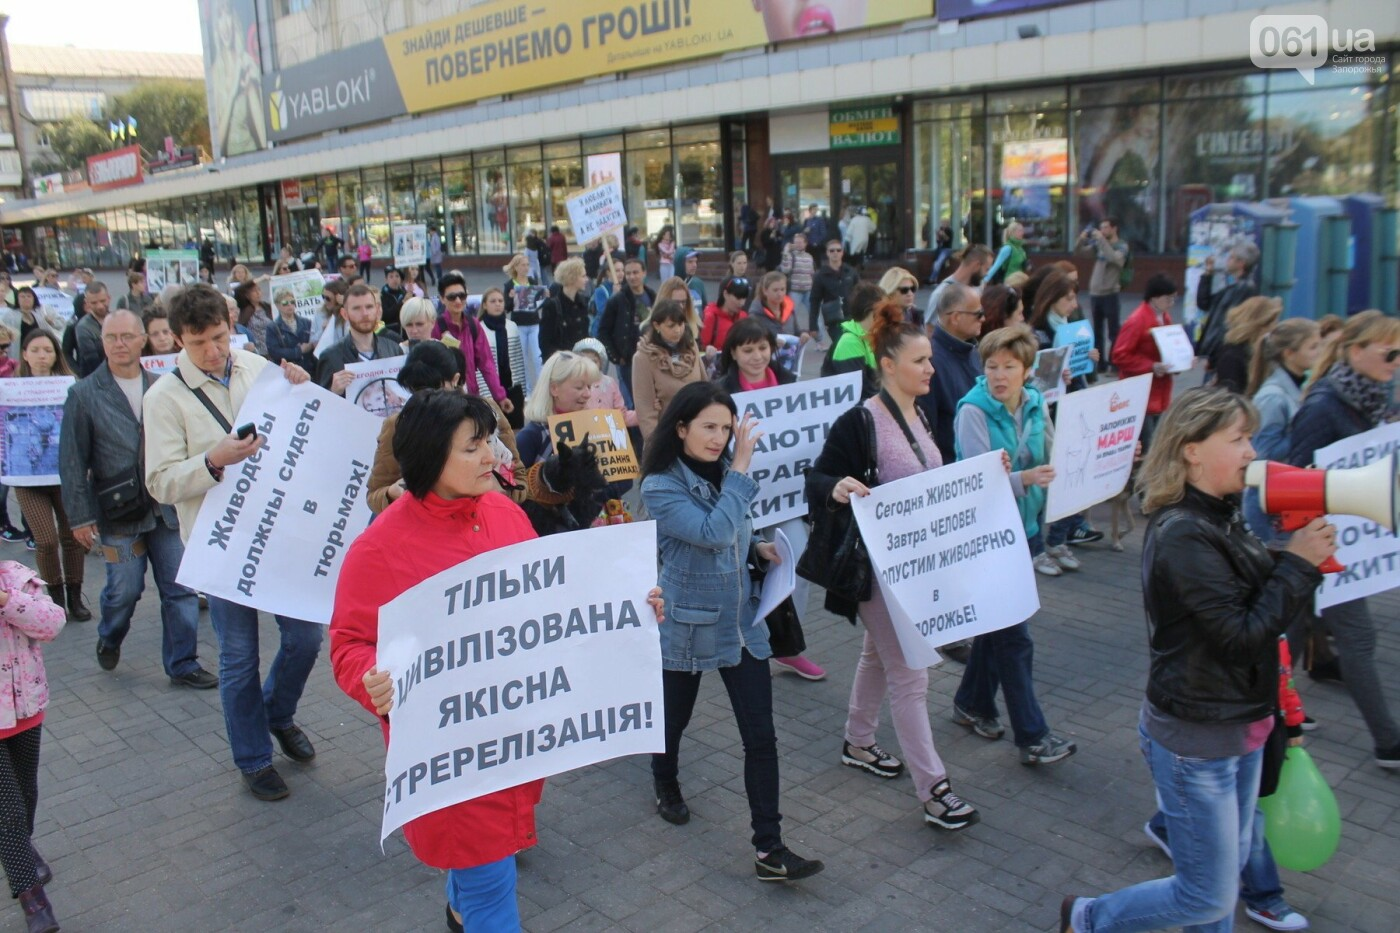 «Защити! Не мучай»: в Запорожье провели марш за права животных, – ФОТОРЕПОРТАЖ, ВИДЕО, фото-23